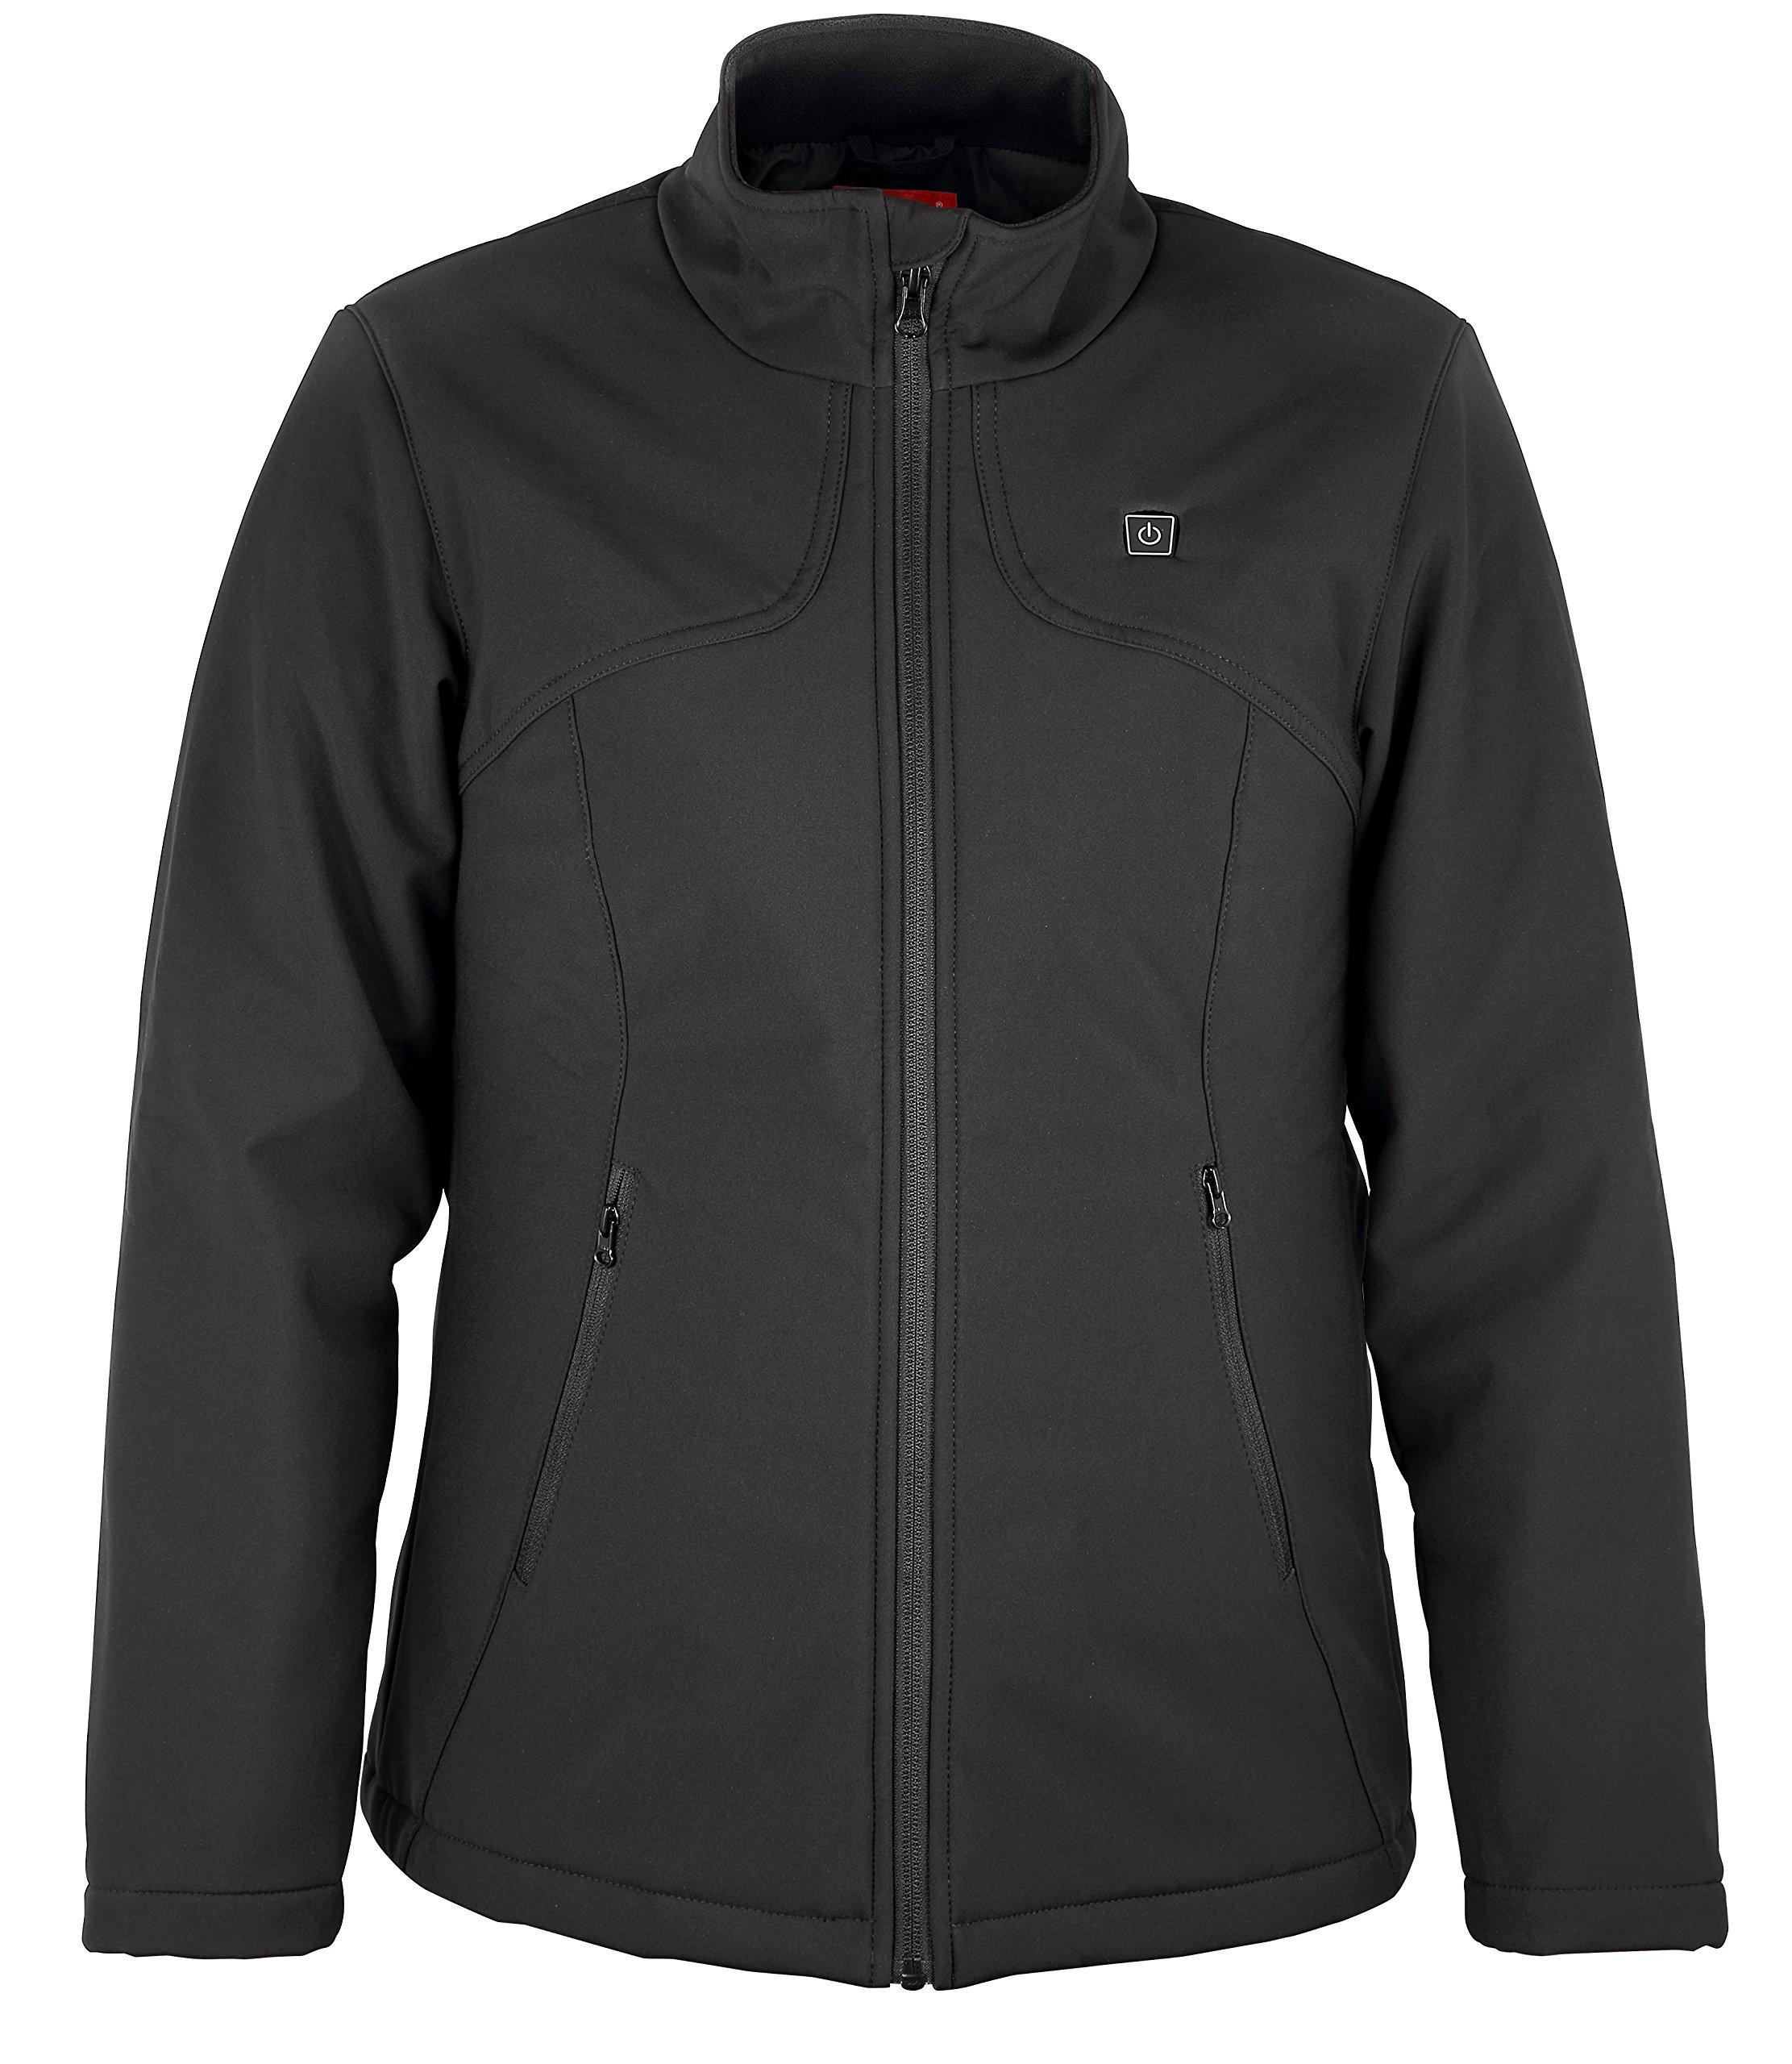 PROsmart Women's Slim Fit Cordless 12Volt Heated Jacket Kit (M)